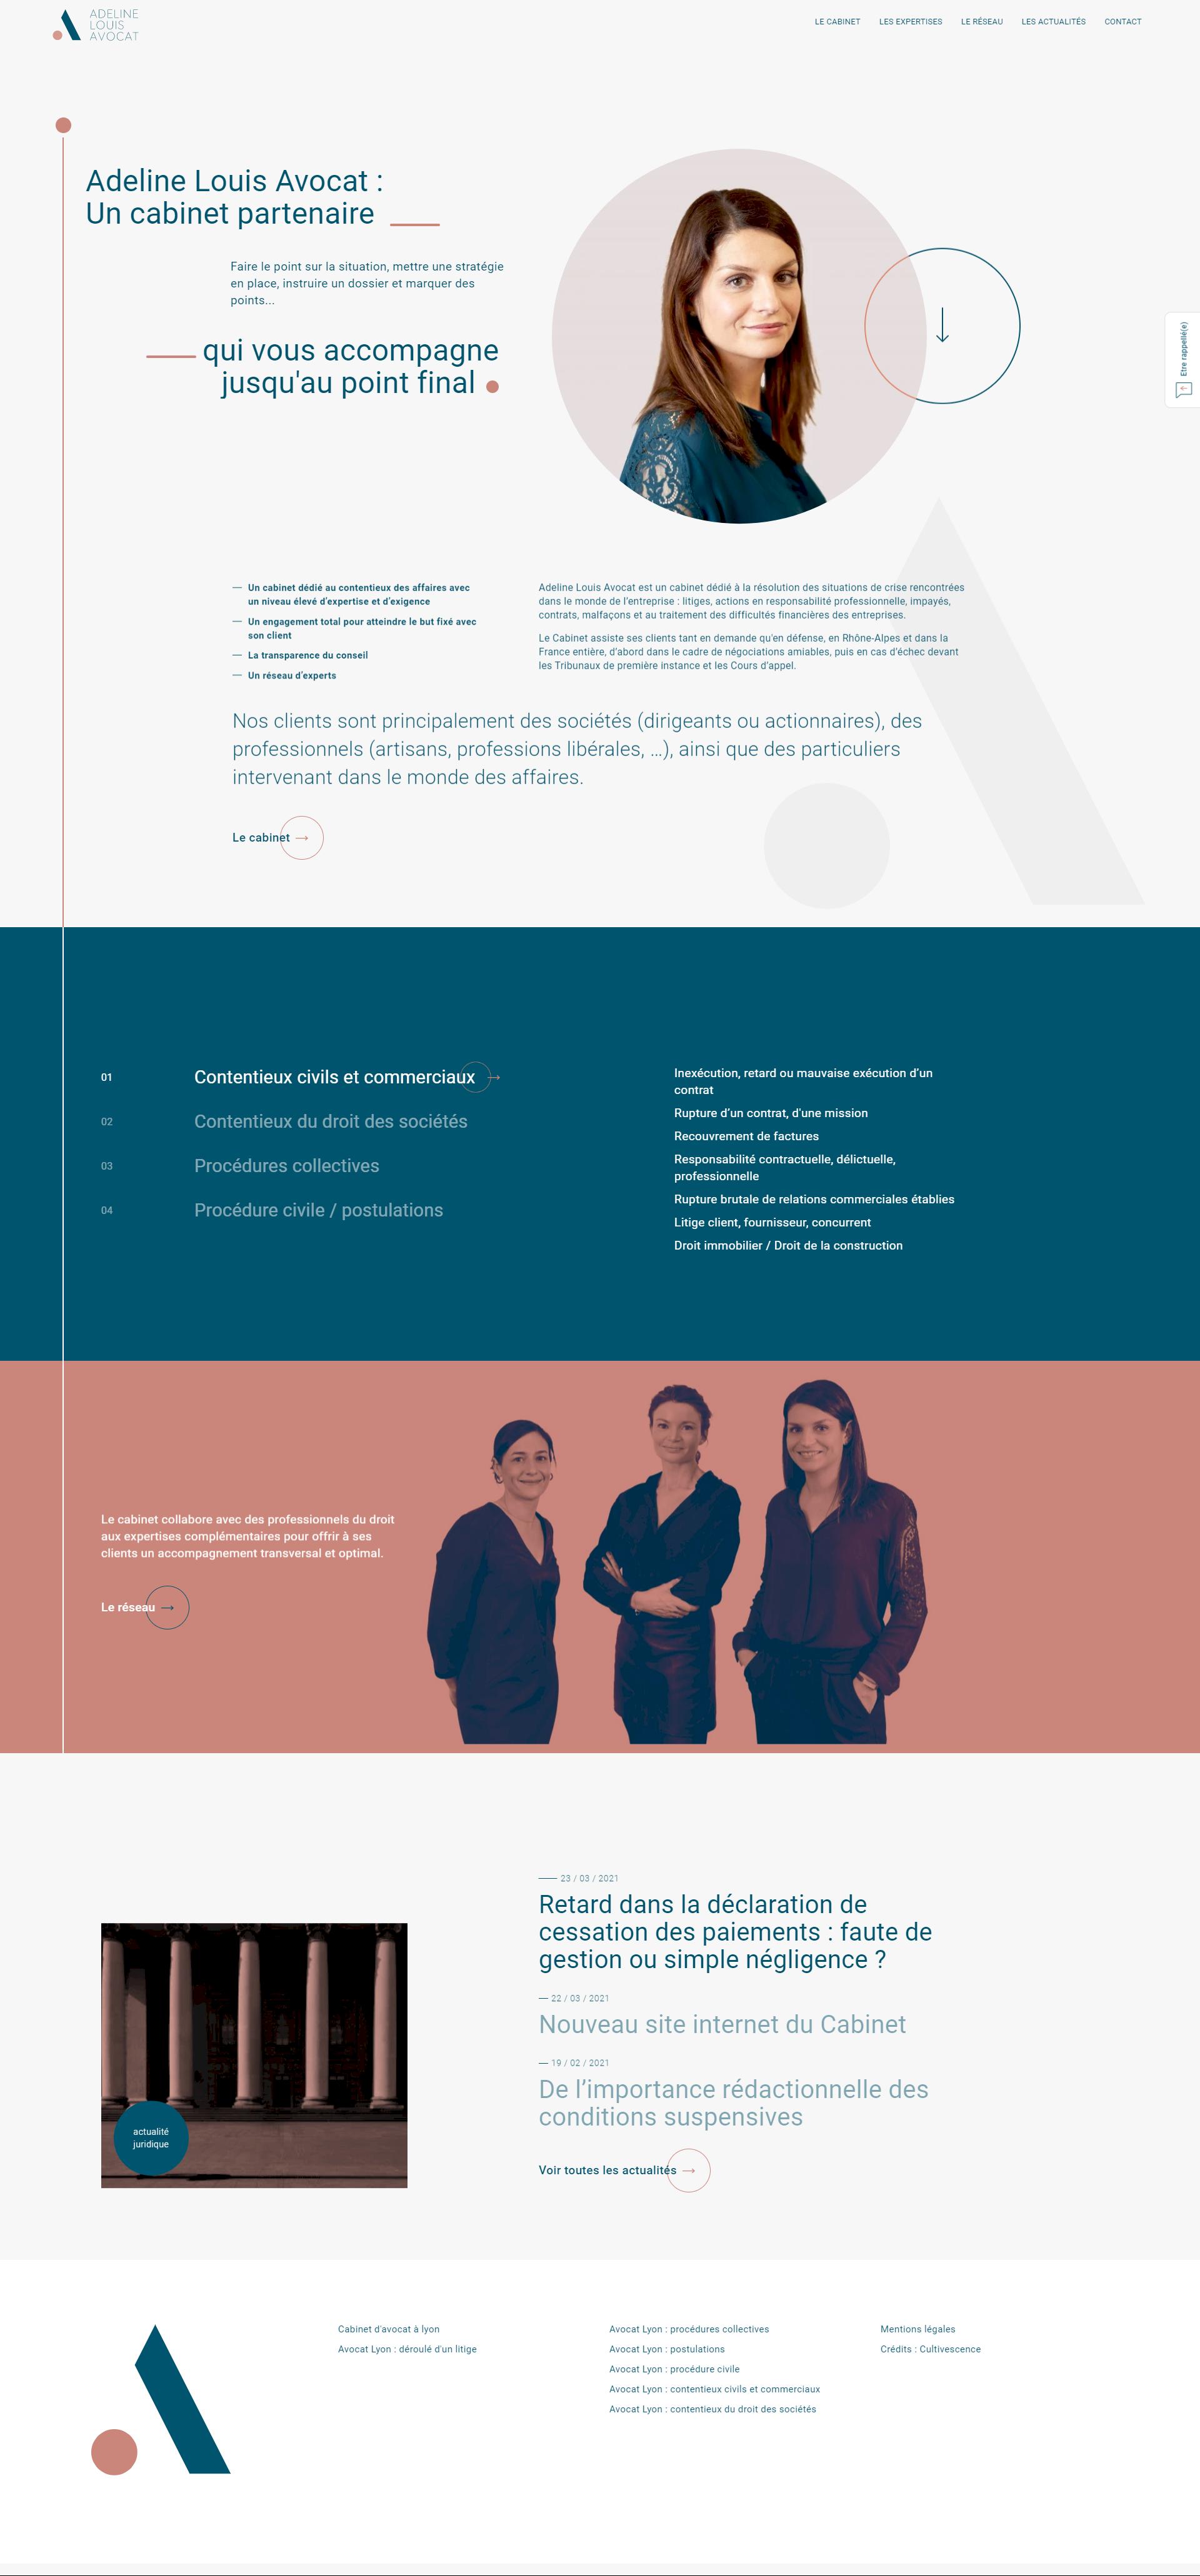 adeline louis avocat - kalfeutre lyon webdesign